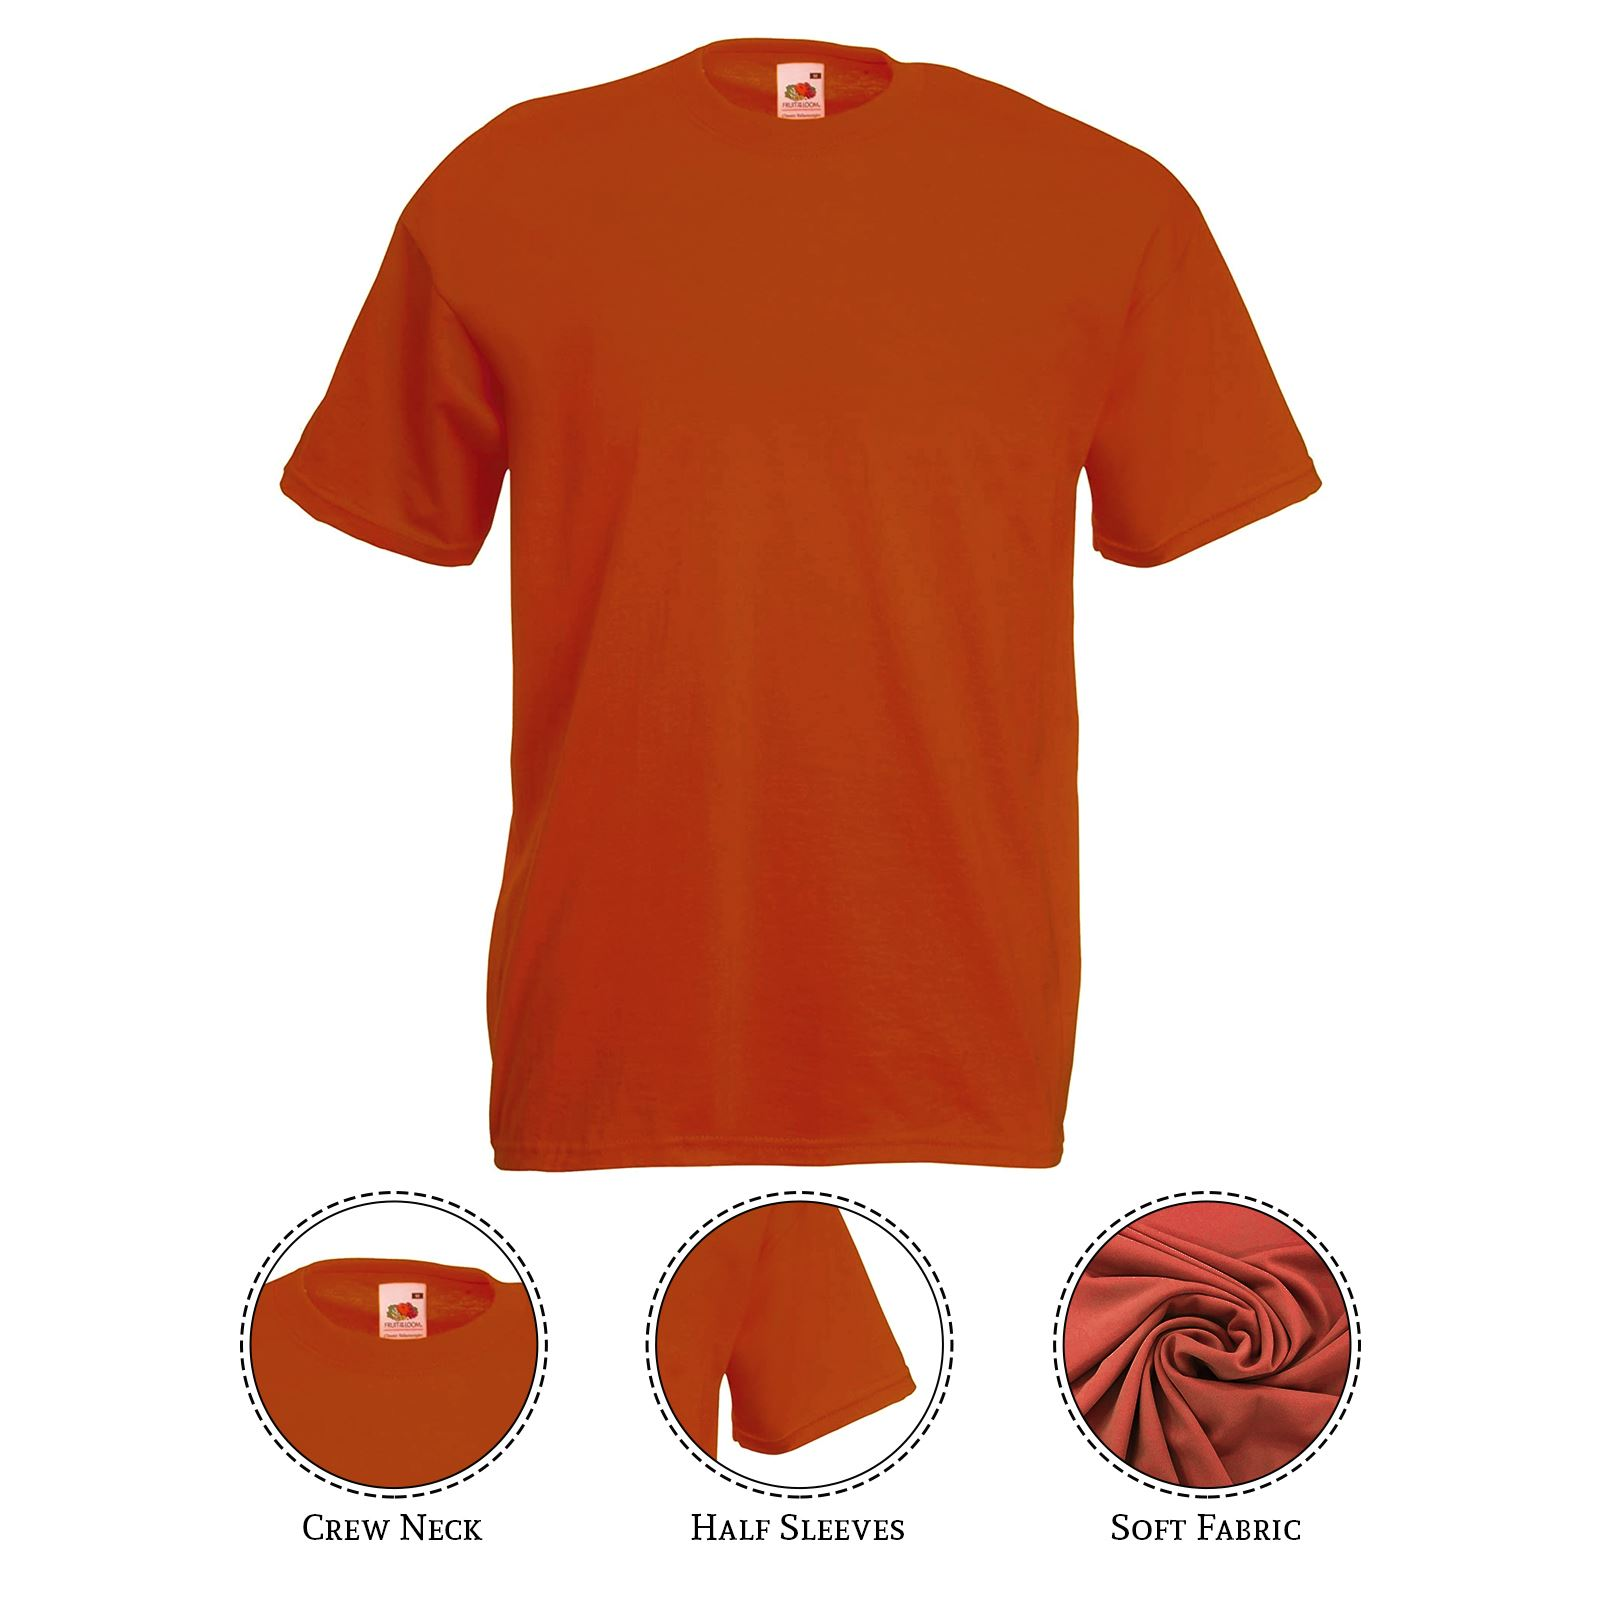 thumbnail 37 - Men-s-Fruit-Of-The-Loom-T-Shirt-Original-100-Cotton-Casual-Plain-Top-Tee